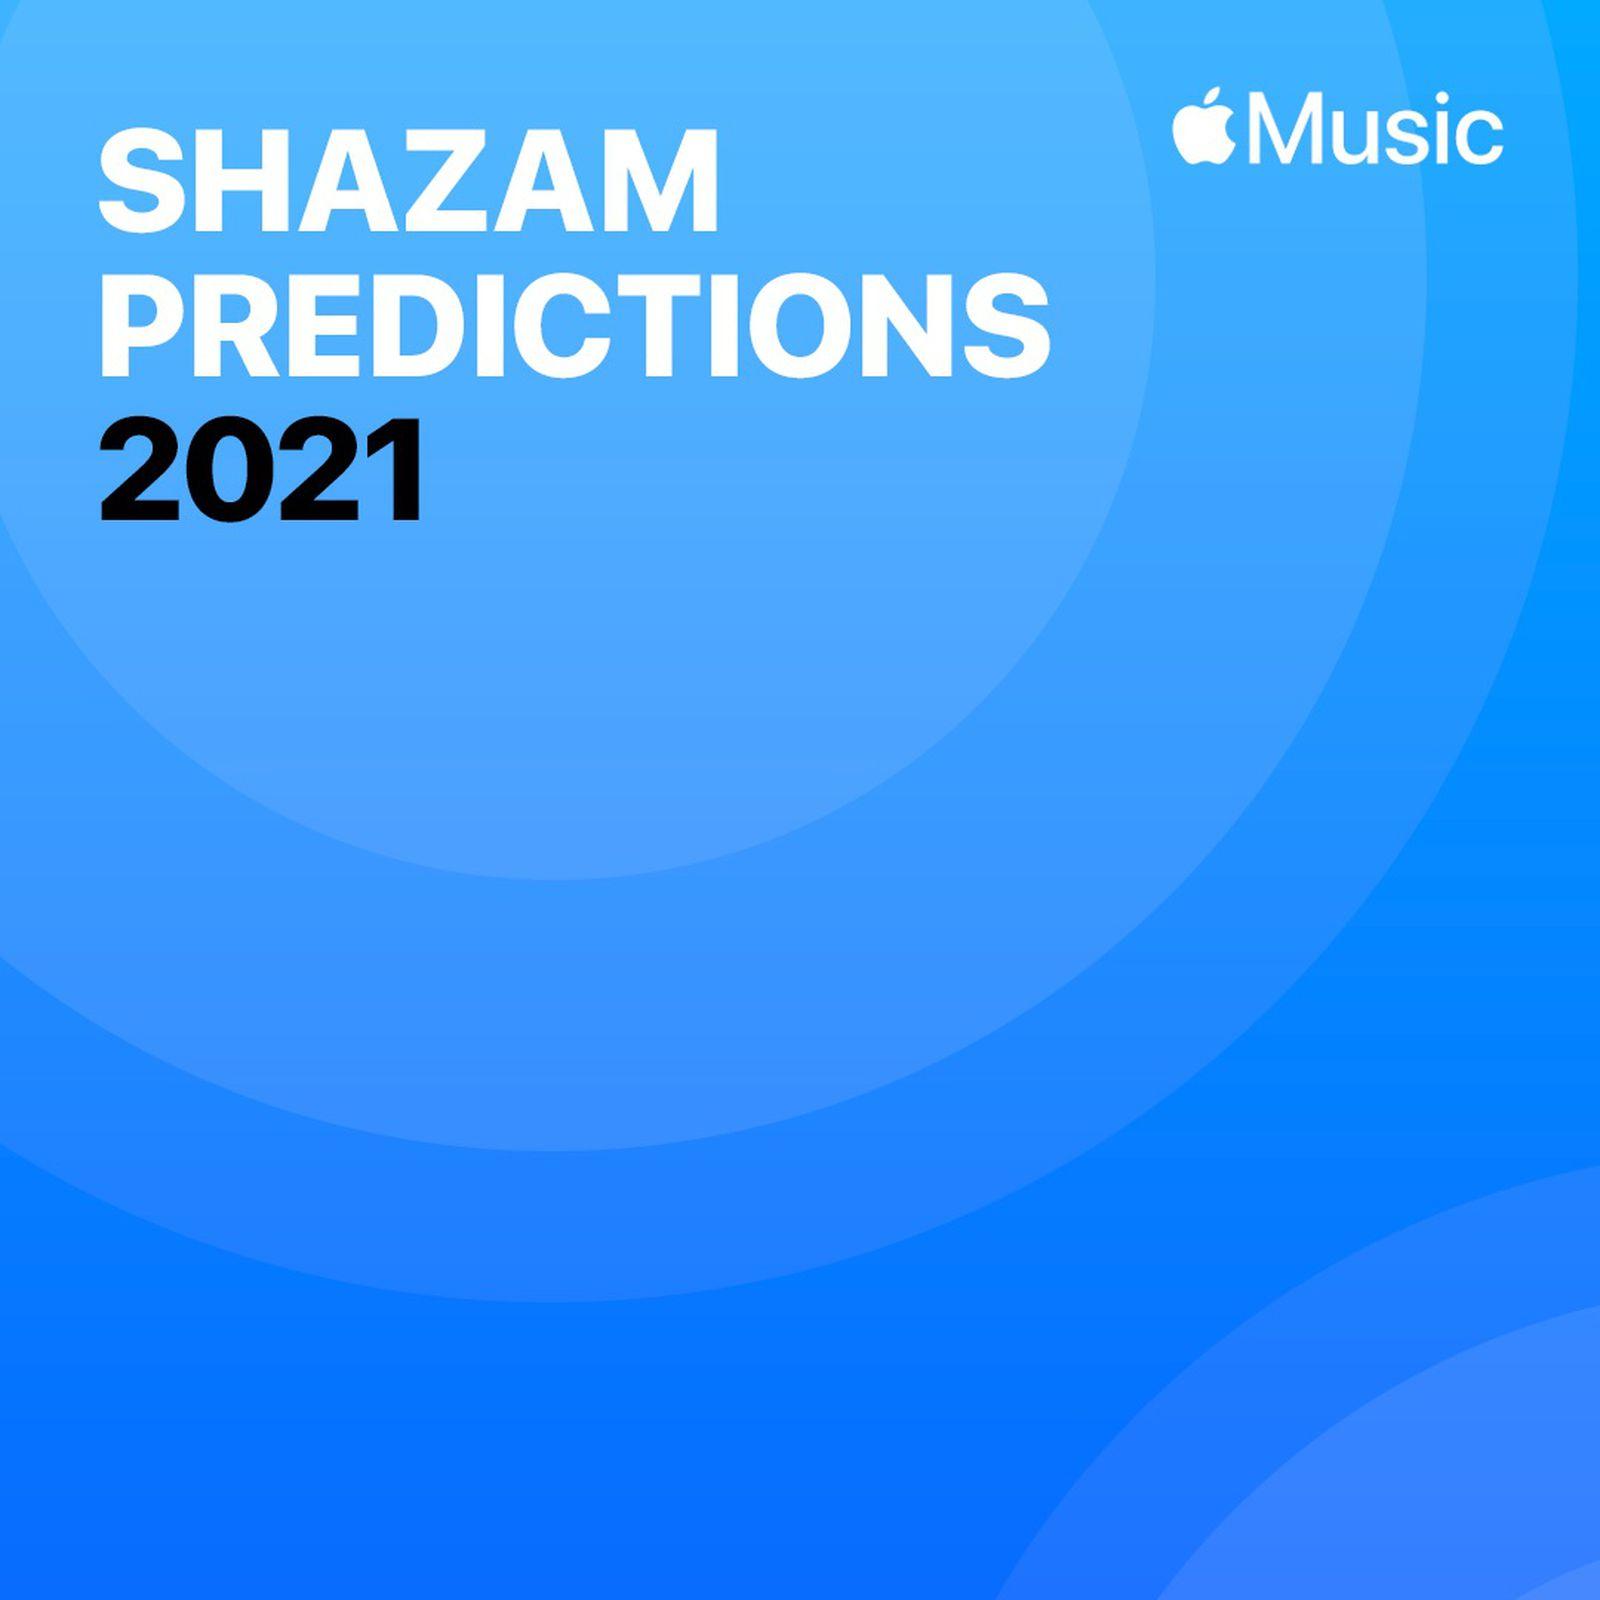 photo of Apple's Shazam Shares 2021 Popular Music Predictions image